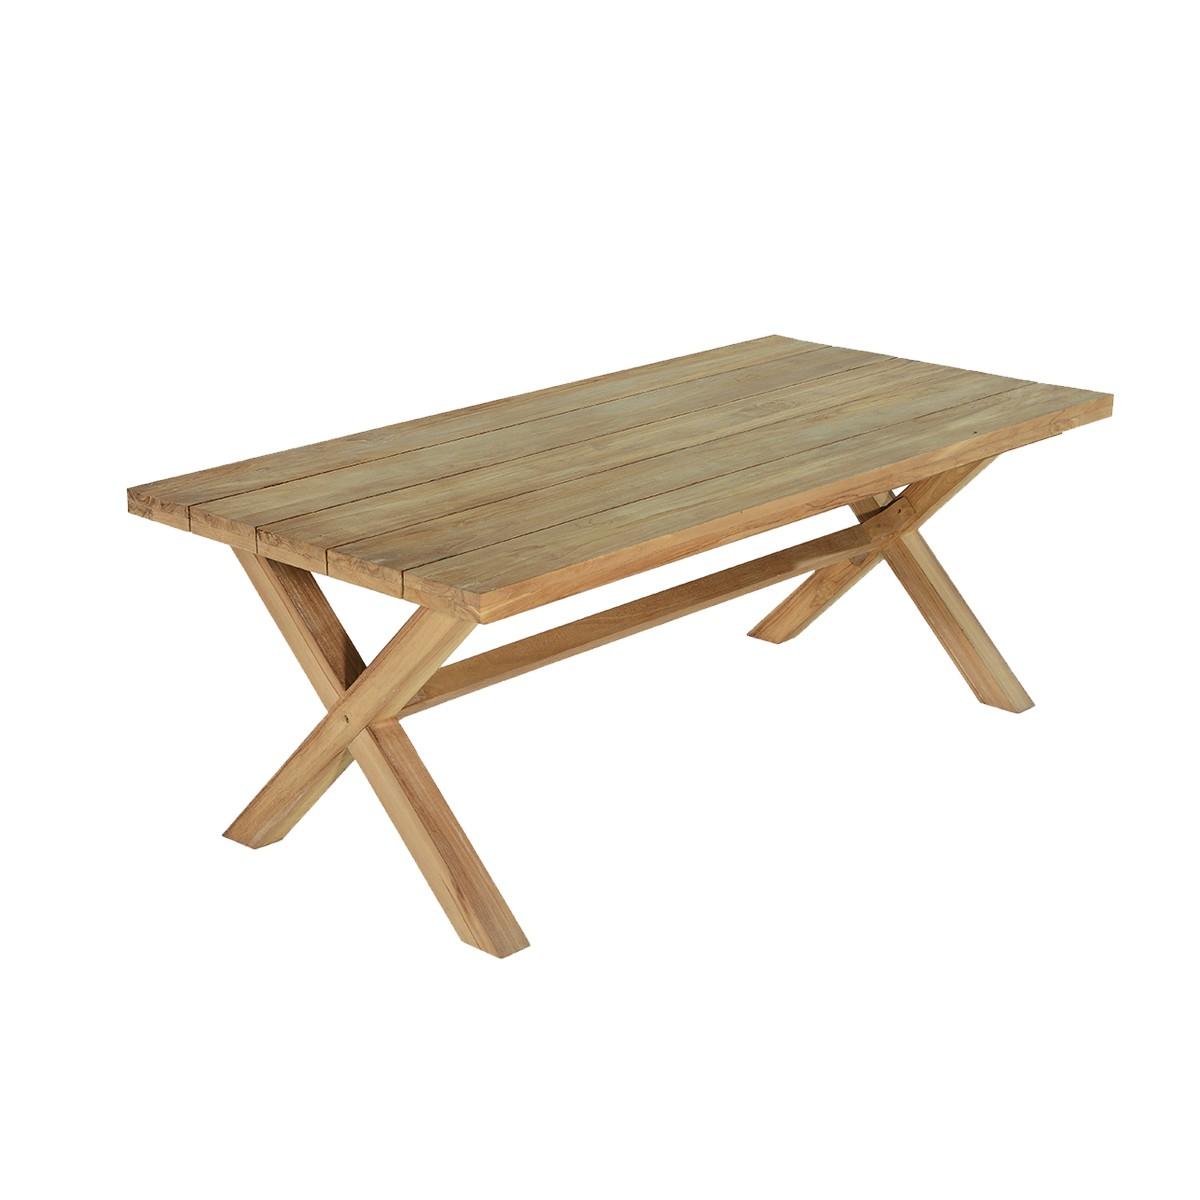 Table de jardin en teck massif L200